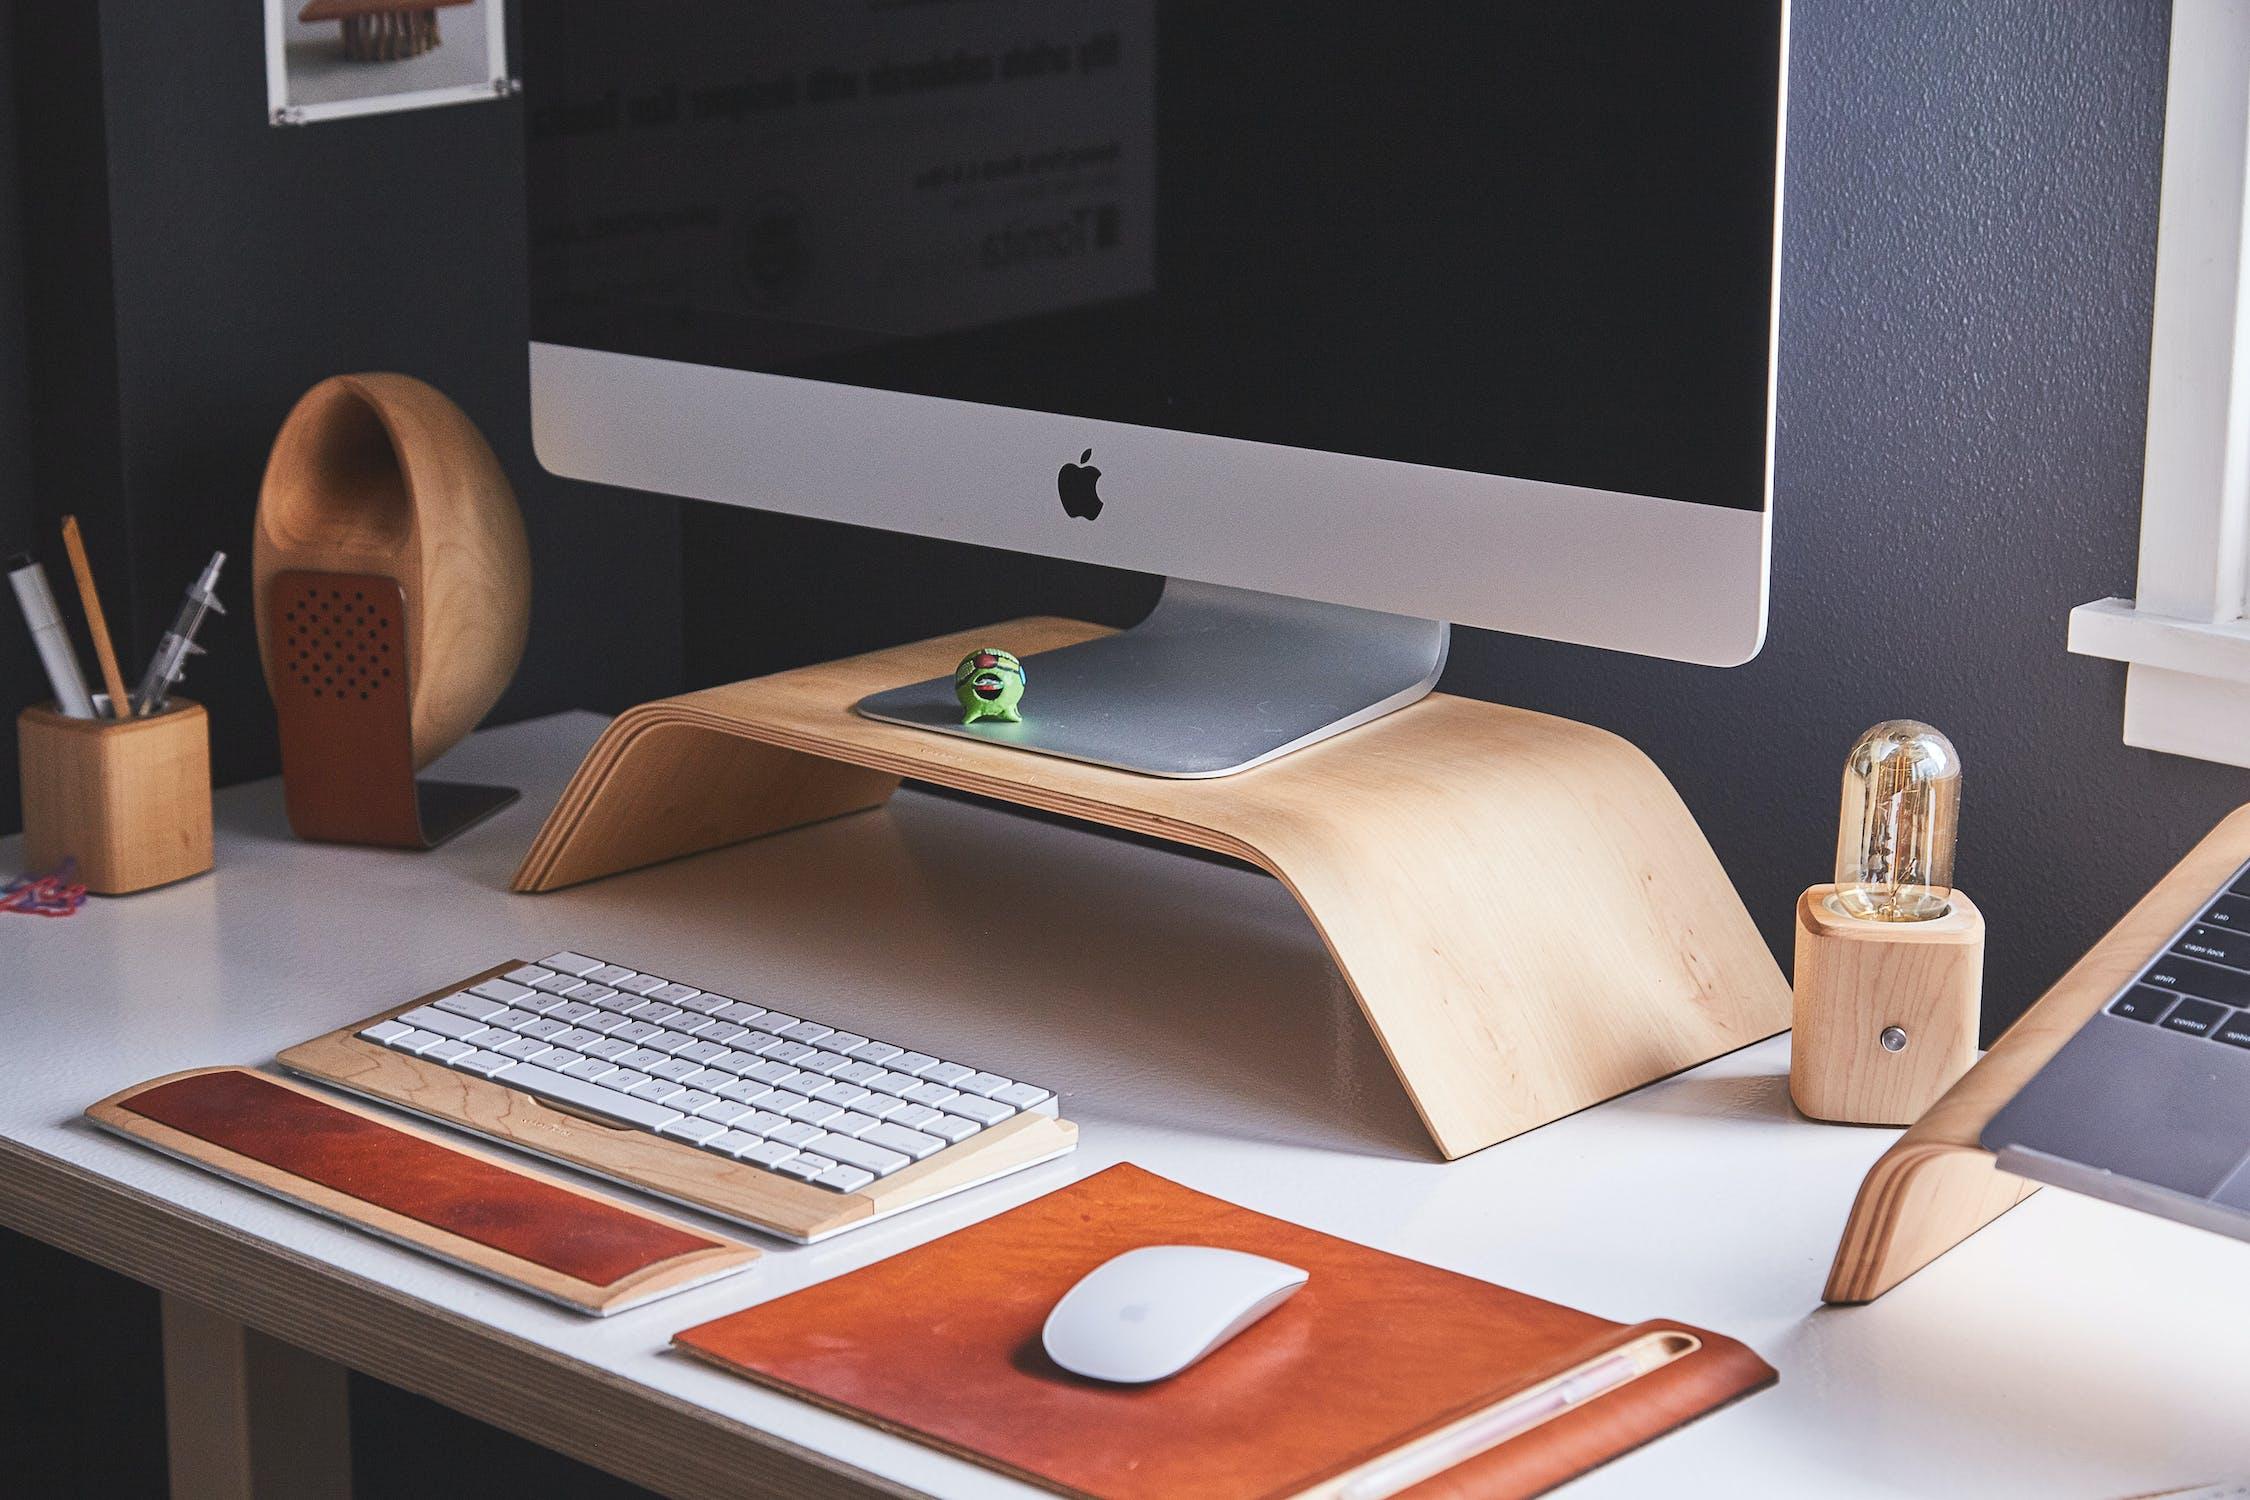 image of Office desk asthetics